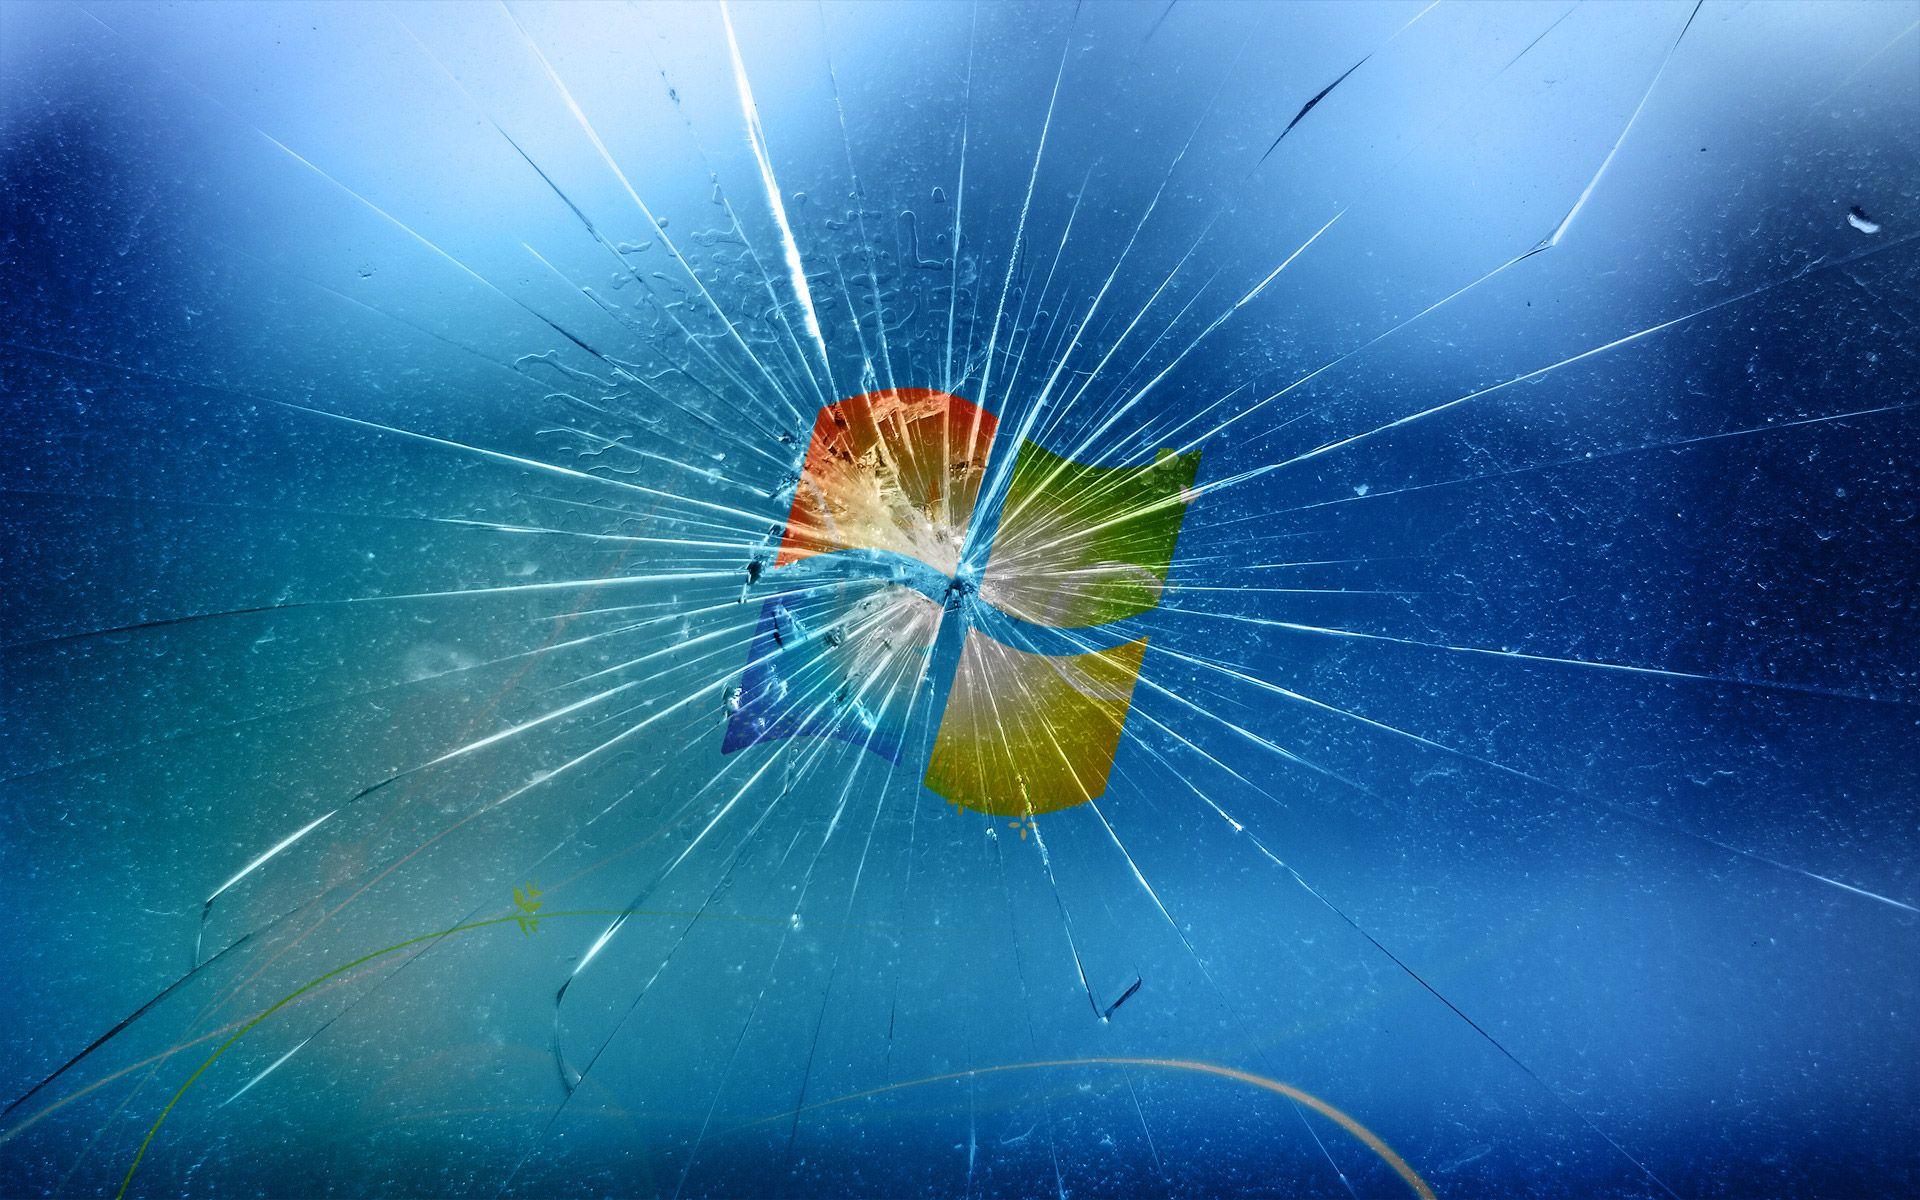 Broken Screen Wallpaper Windows  Hd Best Wallpaper Hd